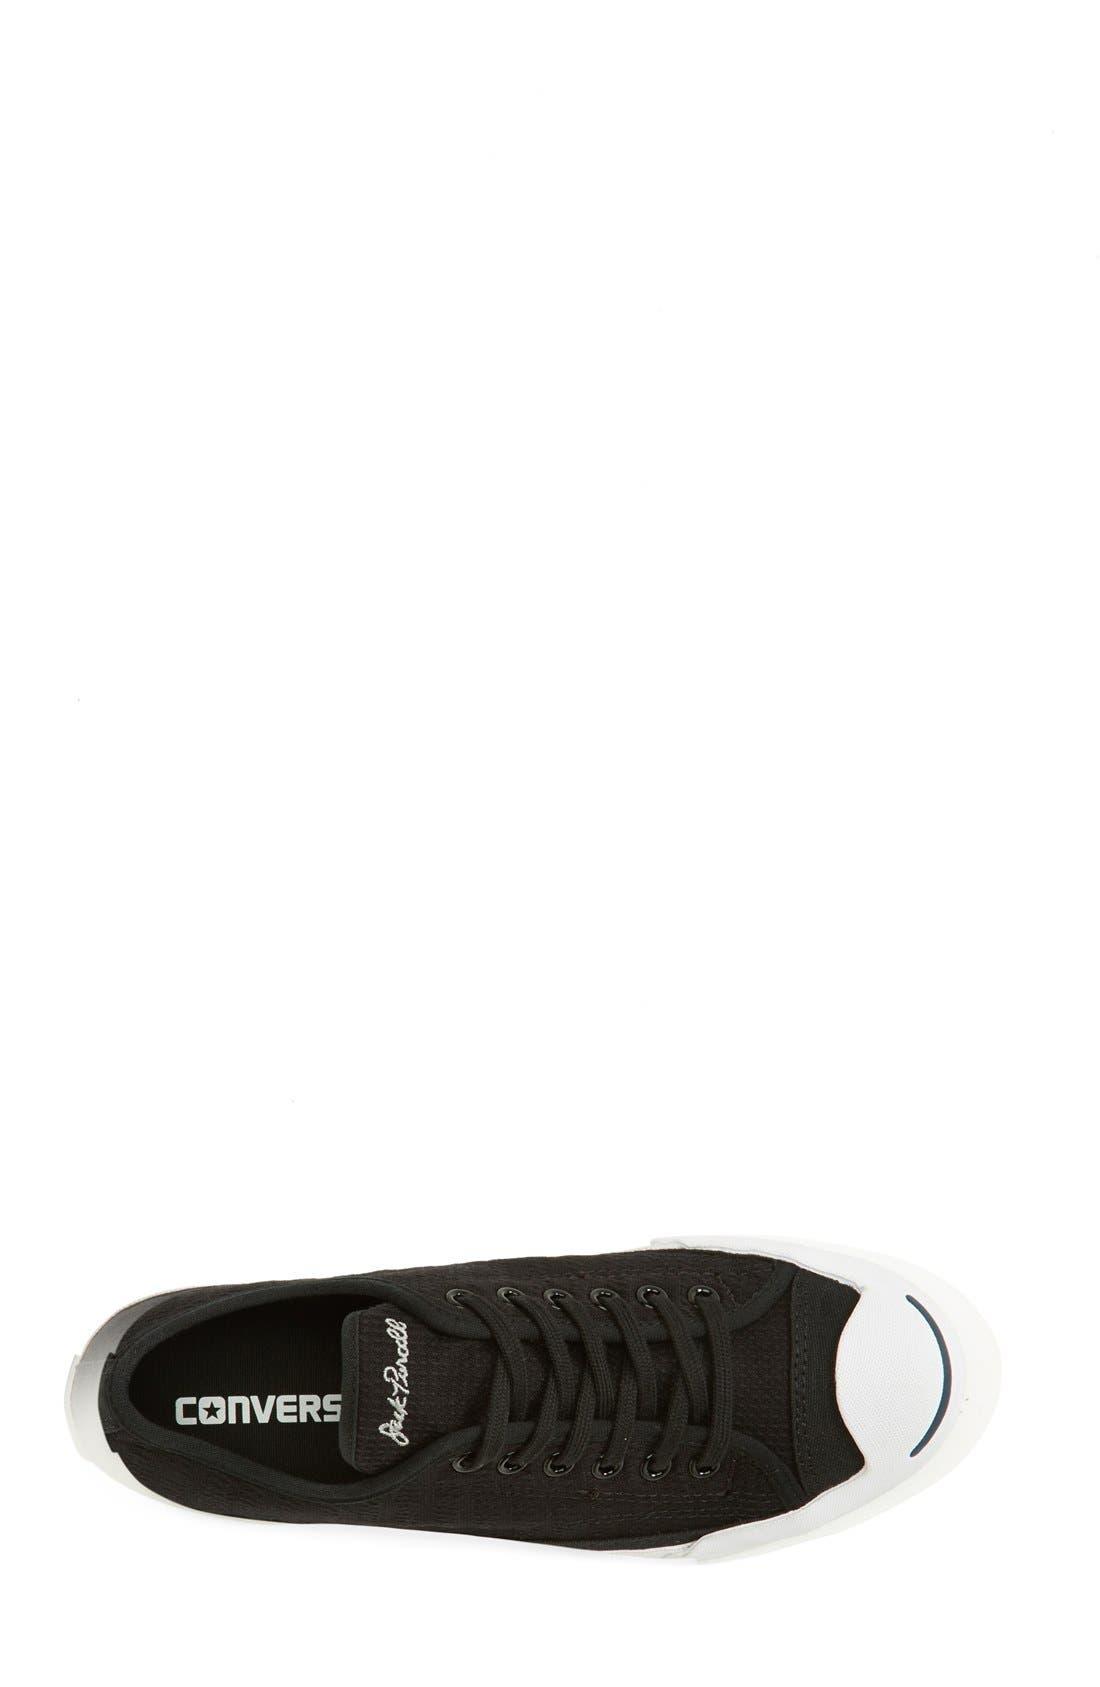 'Jack Purcell' Garment Dye Low Top Sneaker,                             Alternate thumbnail 7, color,